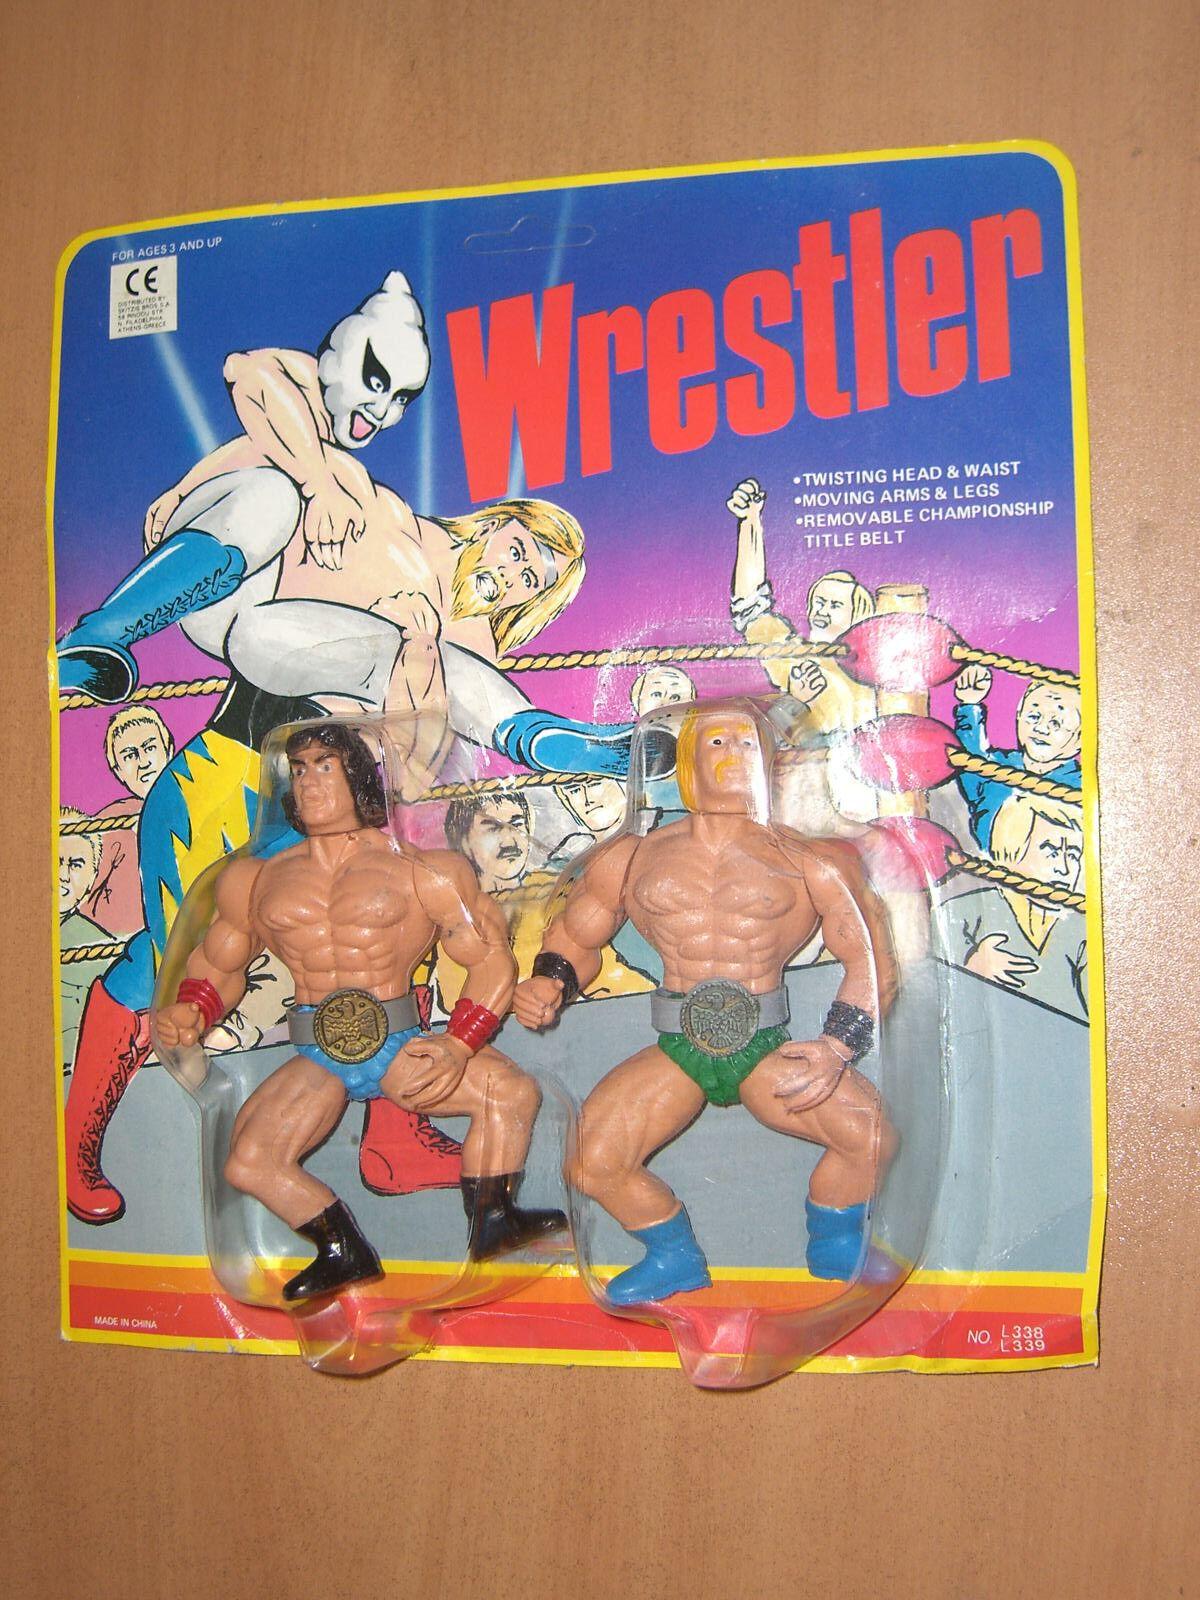 80'S VINTAGE WWF FIGURE WRESTLER CHAMPION MOC MOC MOC ULTRA RARE MOTU KO SGI 11 bf79e9